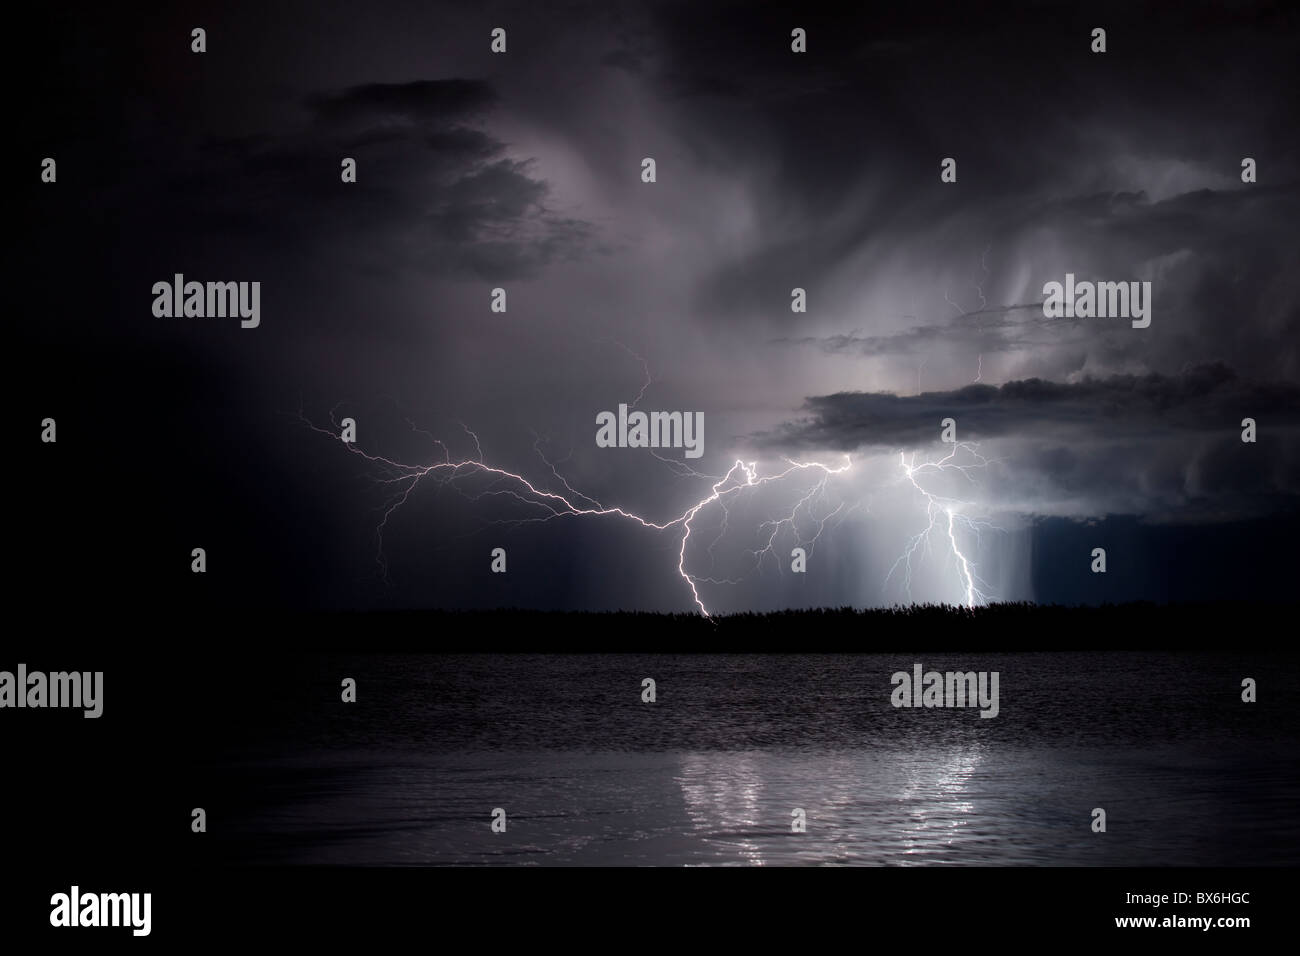 Lightning in Illa de Buda, Natural Park of Delta de l'Ebre, Tarragona, Spain Stock Photo